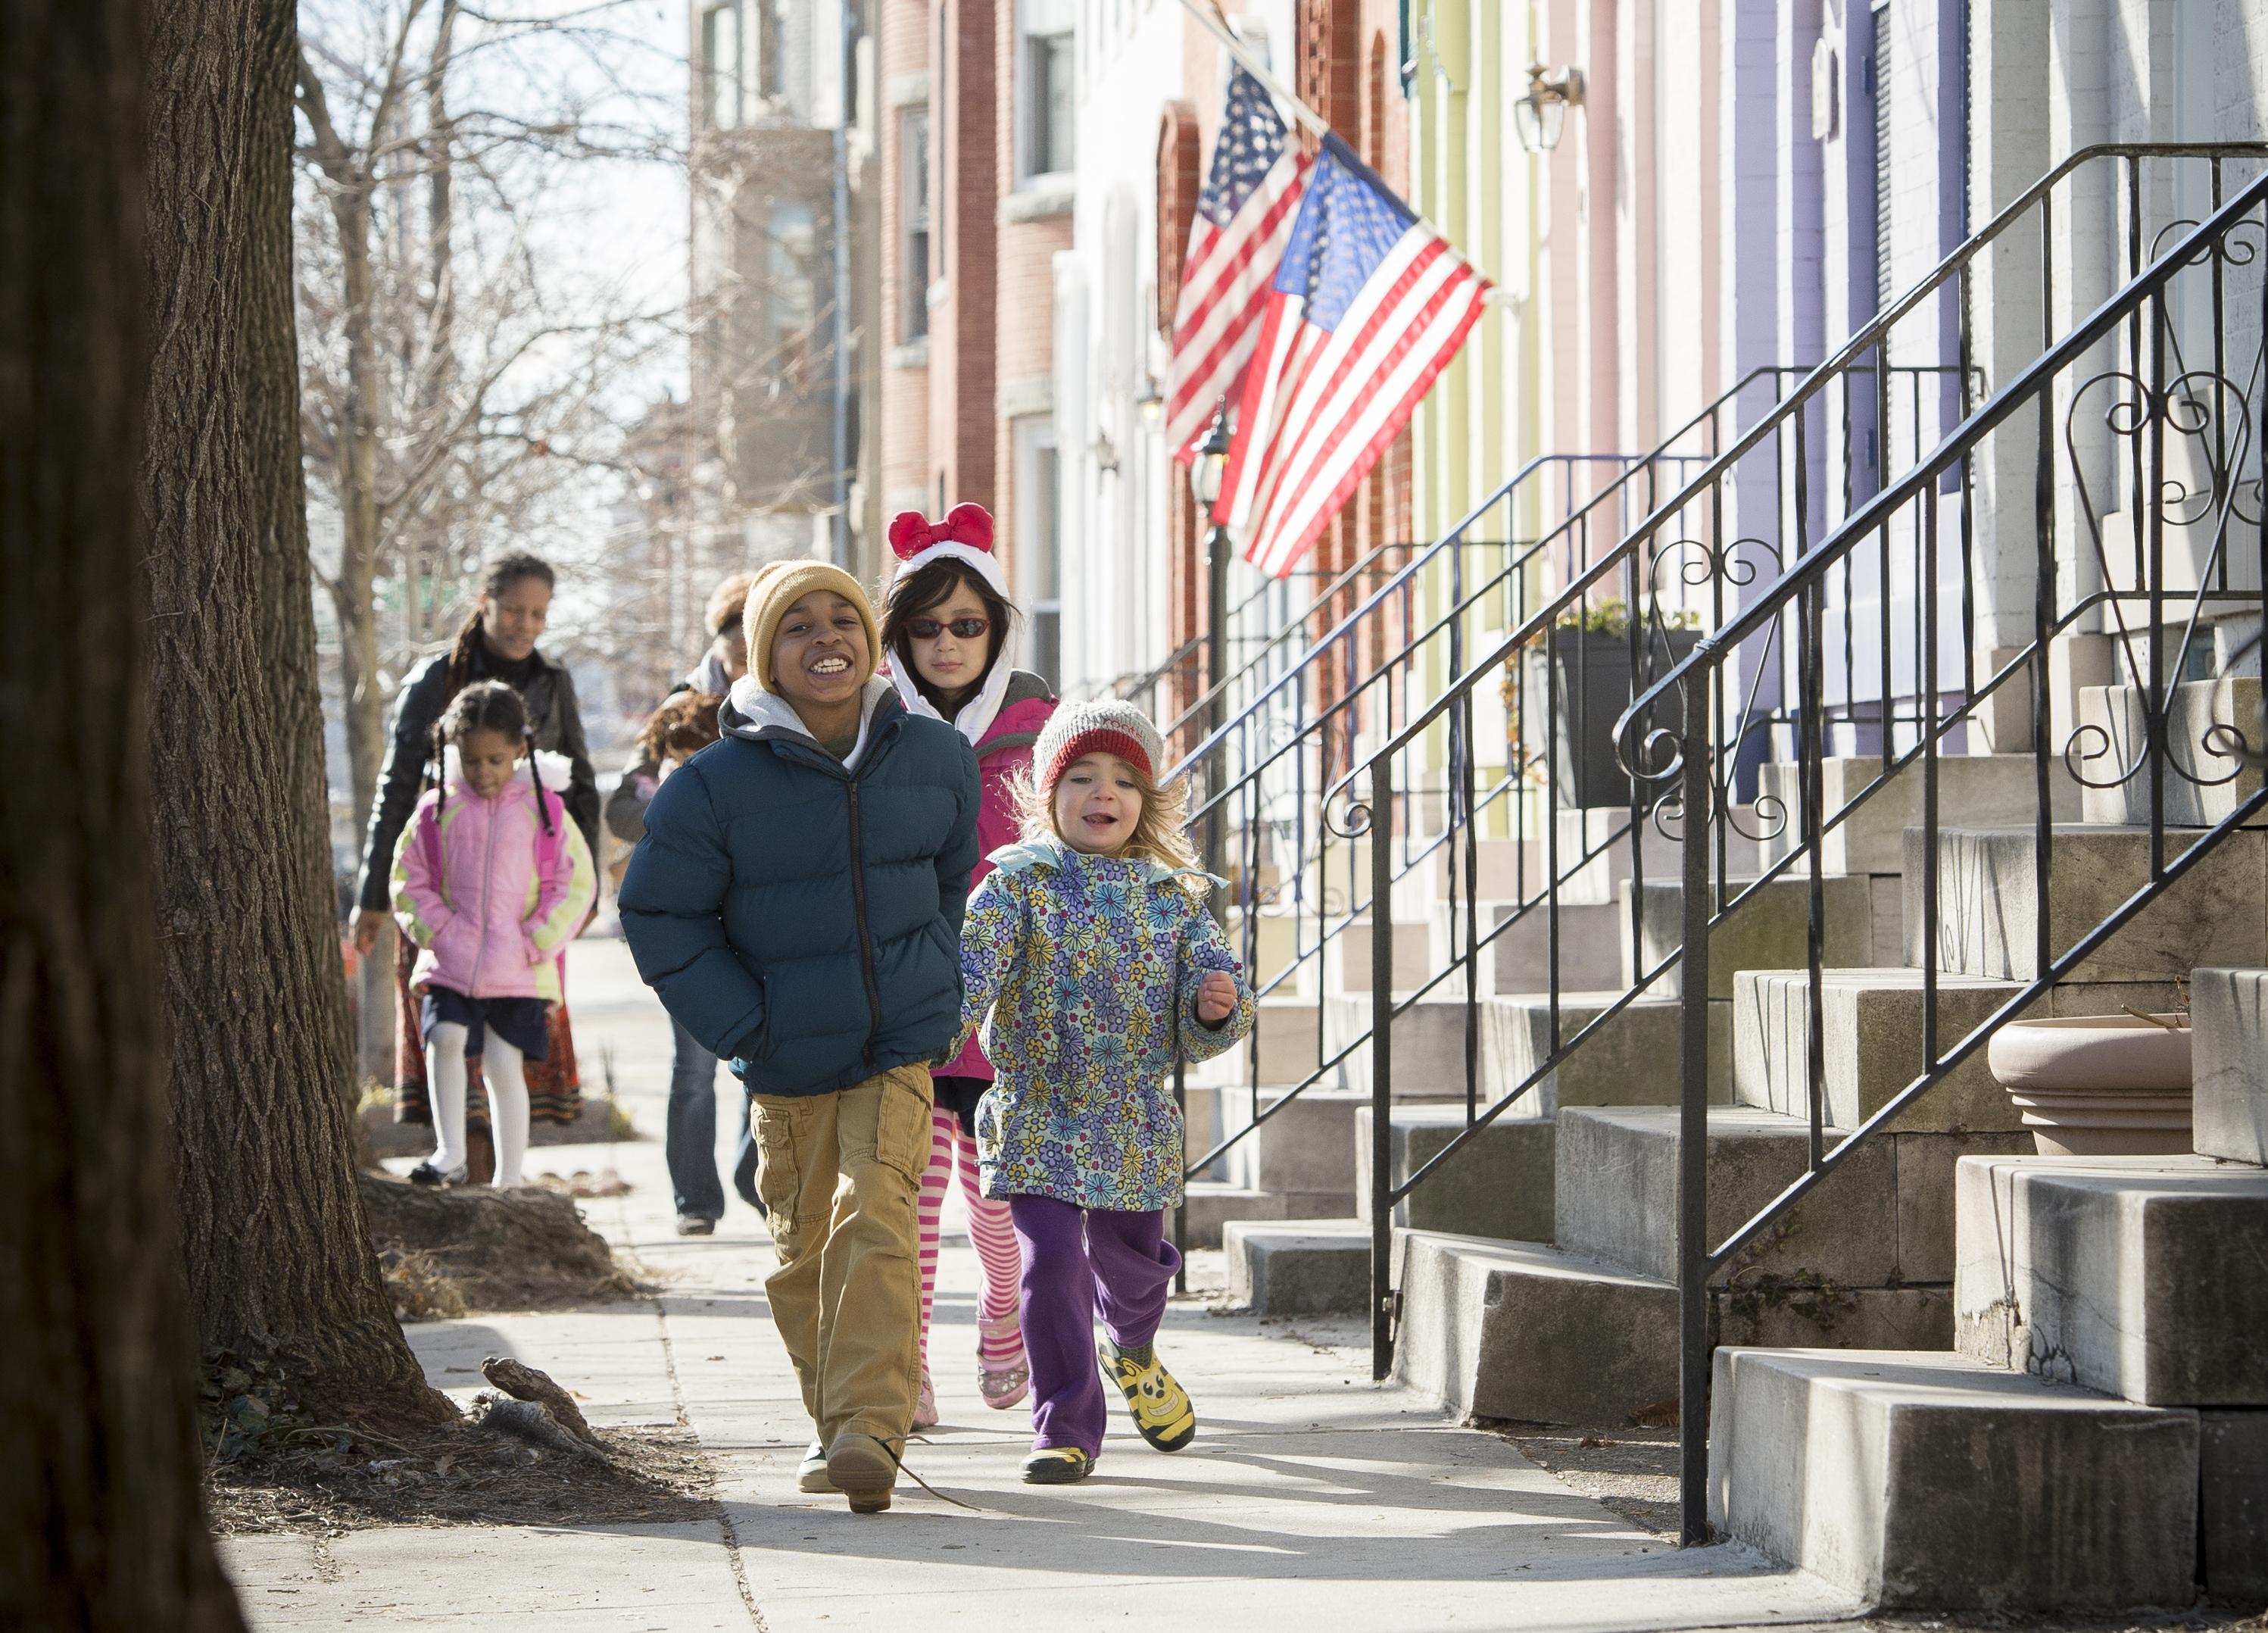 Great Schools Charles Village Neighborhood - School Partnership